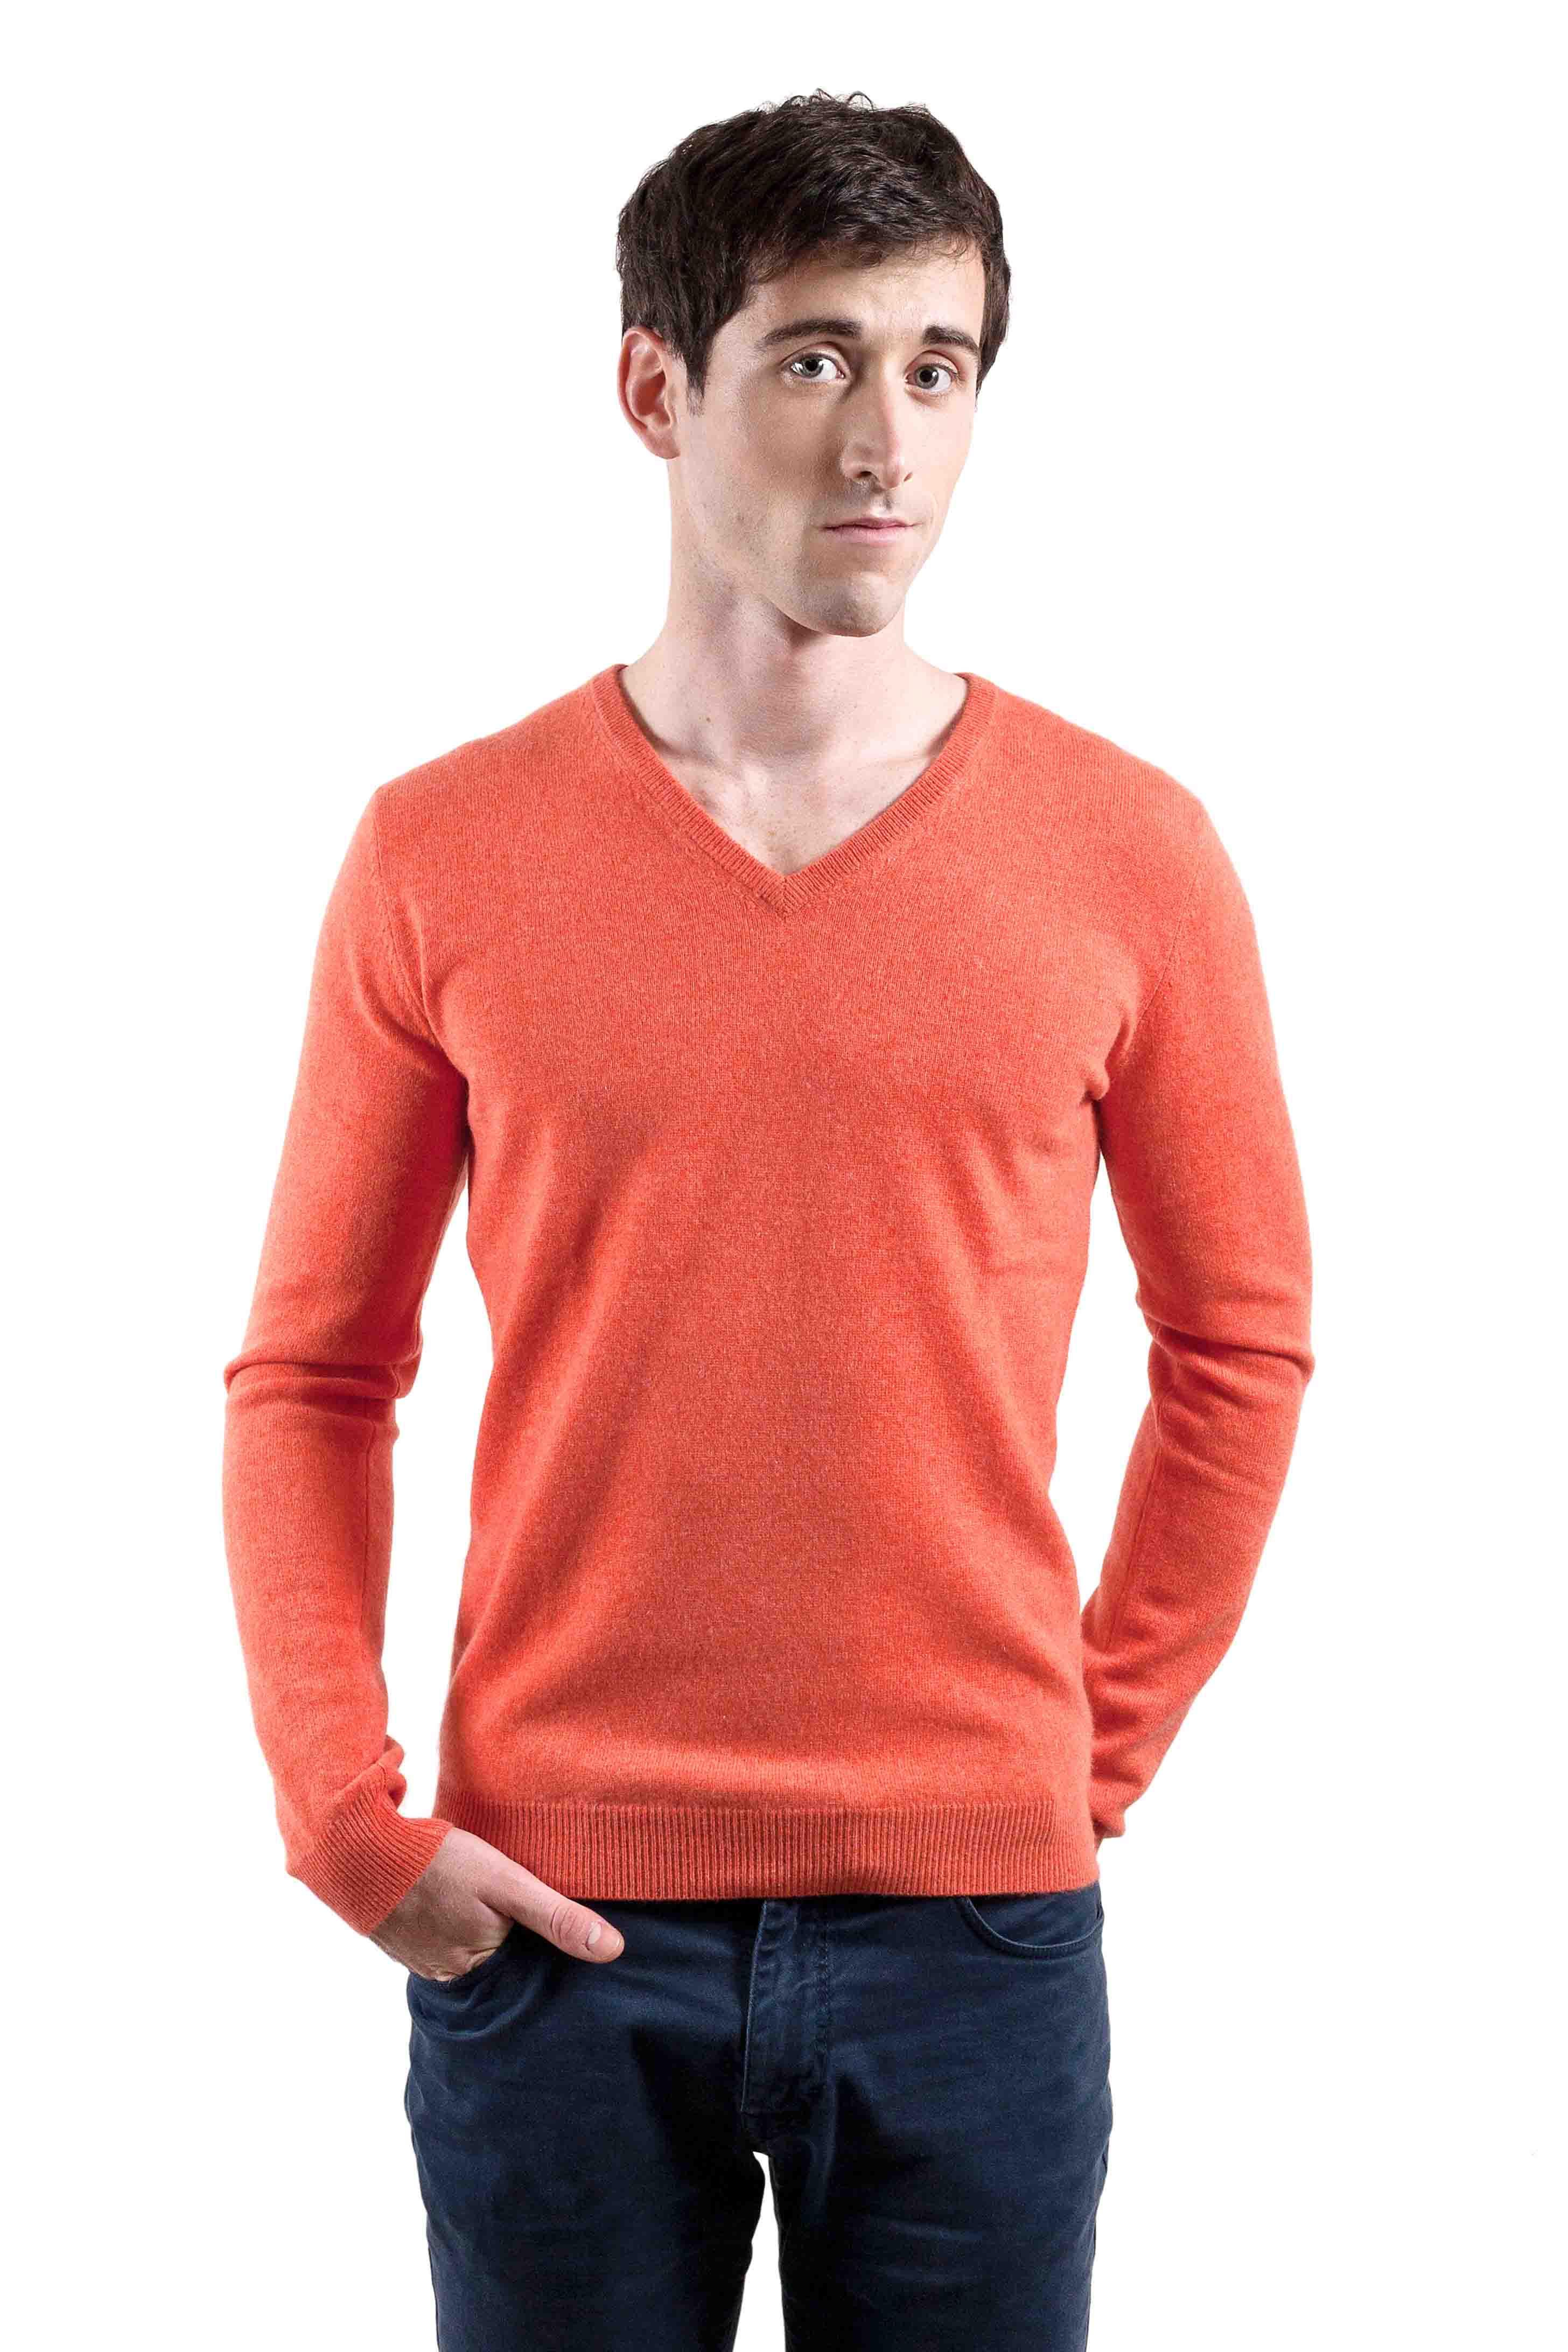 Pull cachemire homme SANTOROS-orange-S